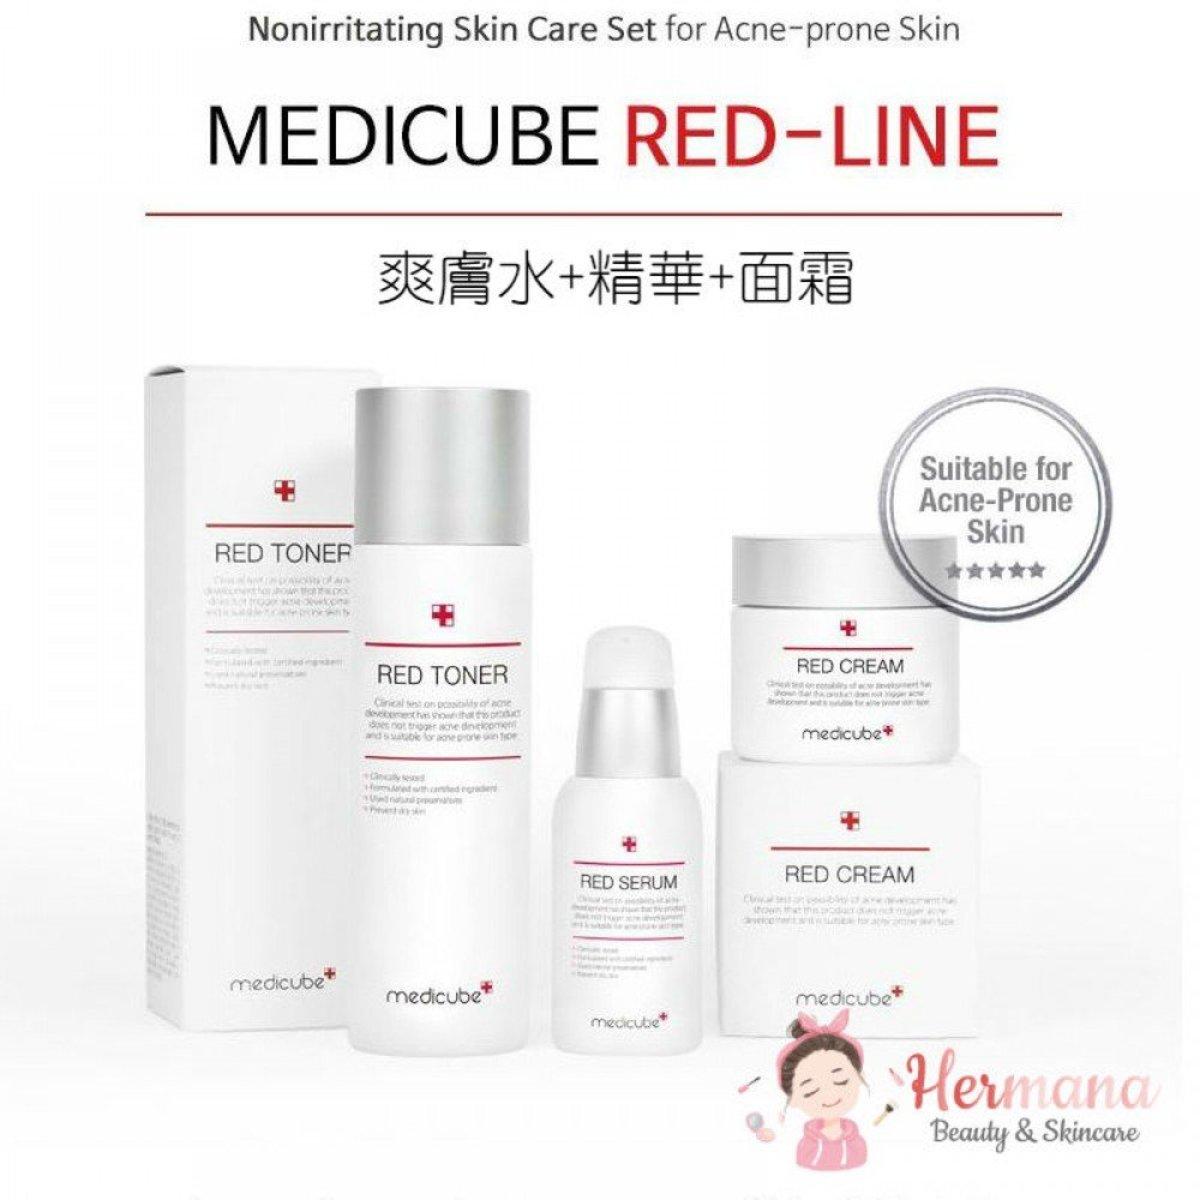 Medicube Red 舒緩抗痘修復3件優惠套裝